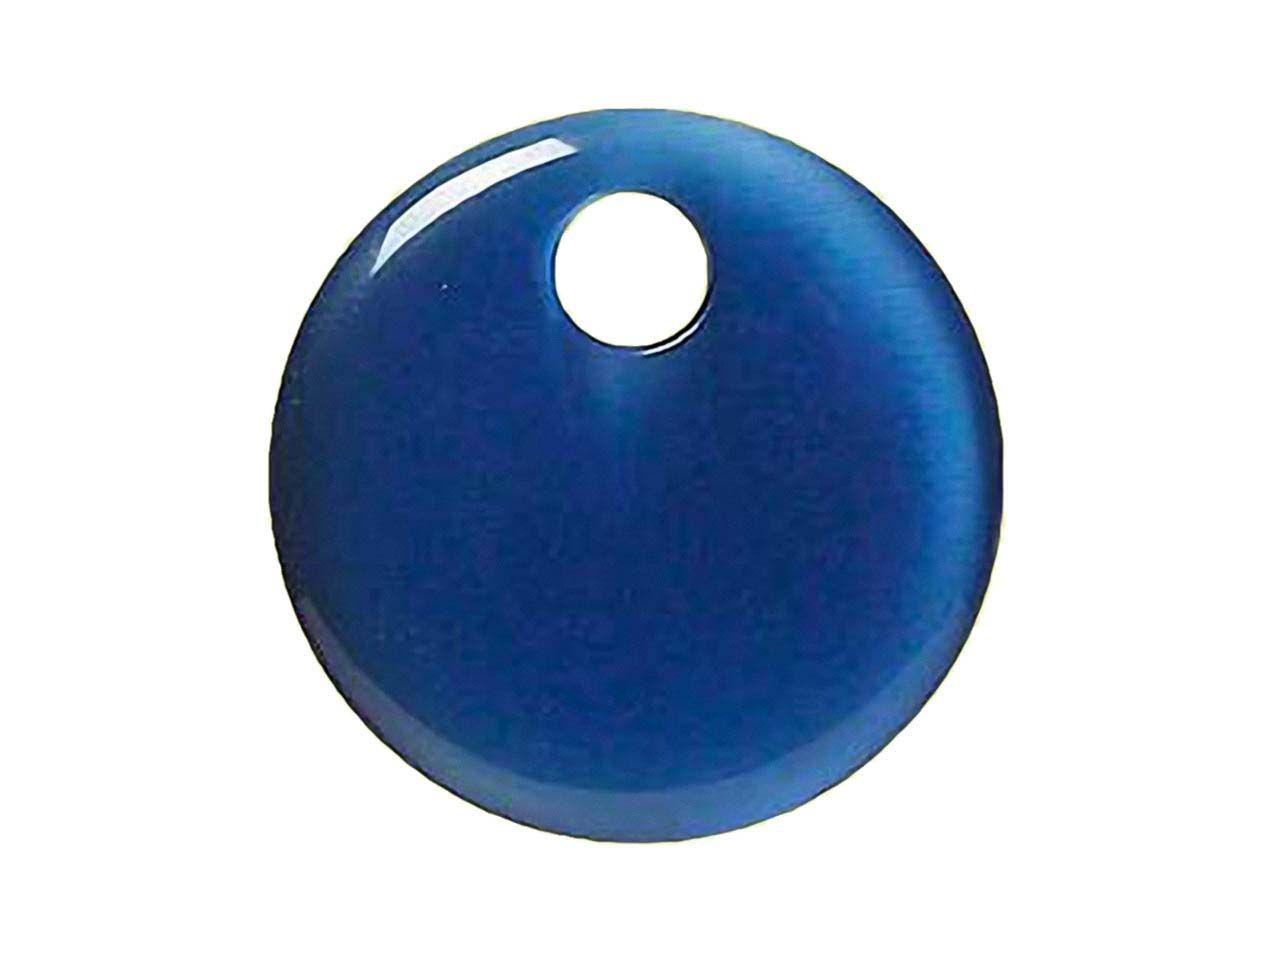 6 mm 50 Crackleglasperlen in blau /& flieder